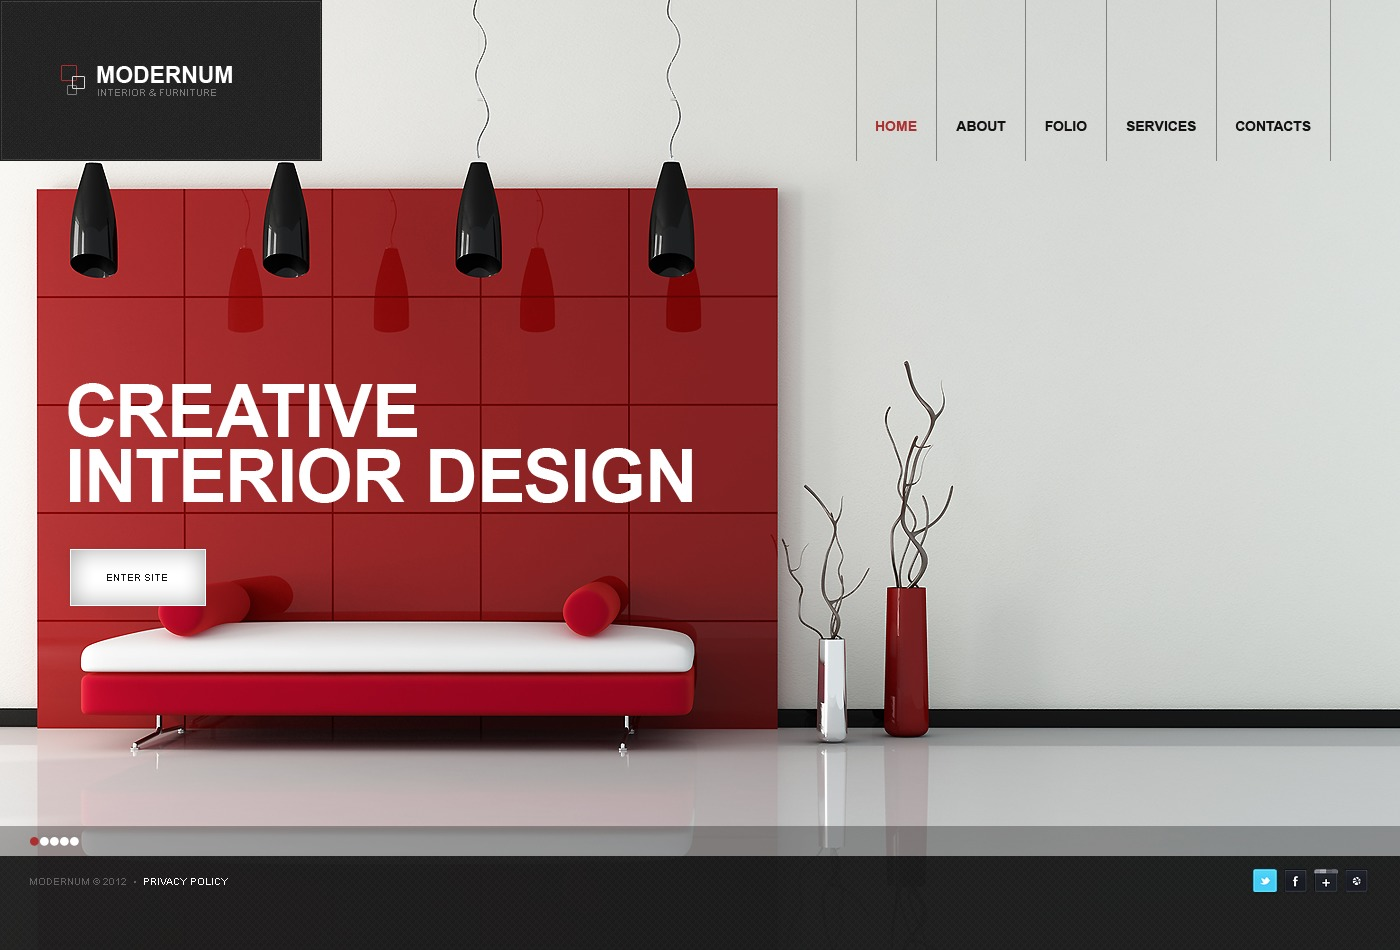 Код кнопки дизайн интерьера